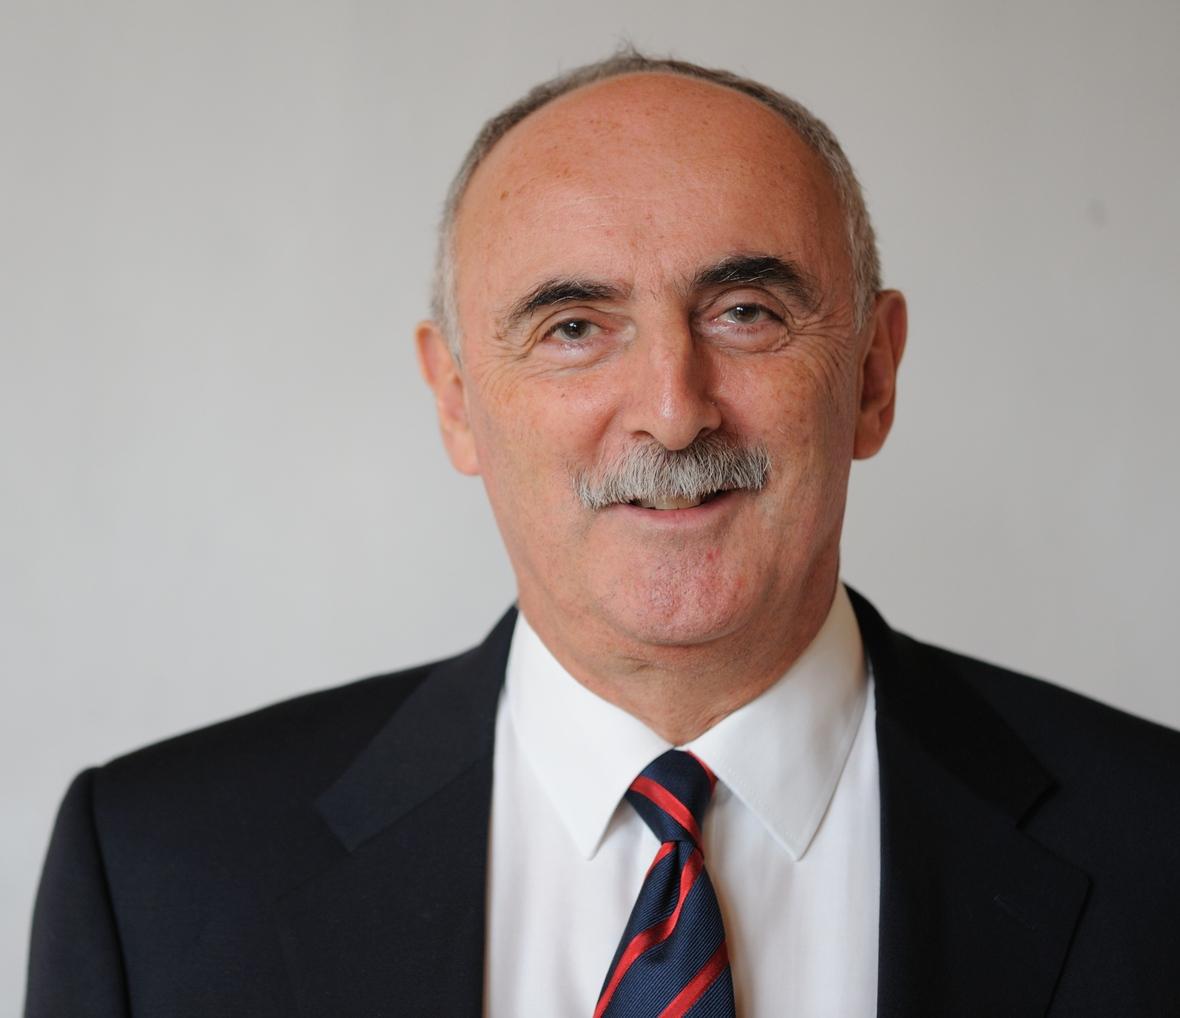 Dr Ernesto Engel